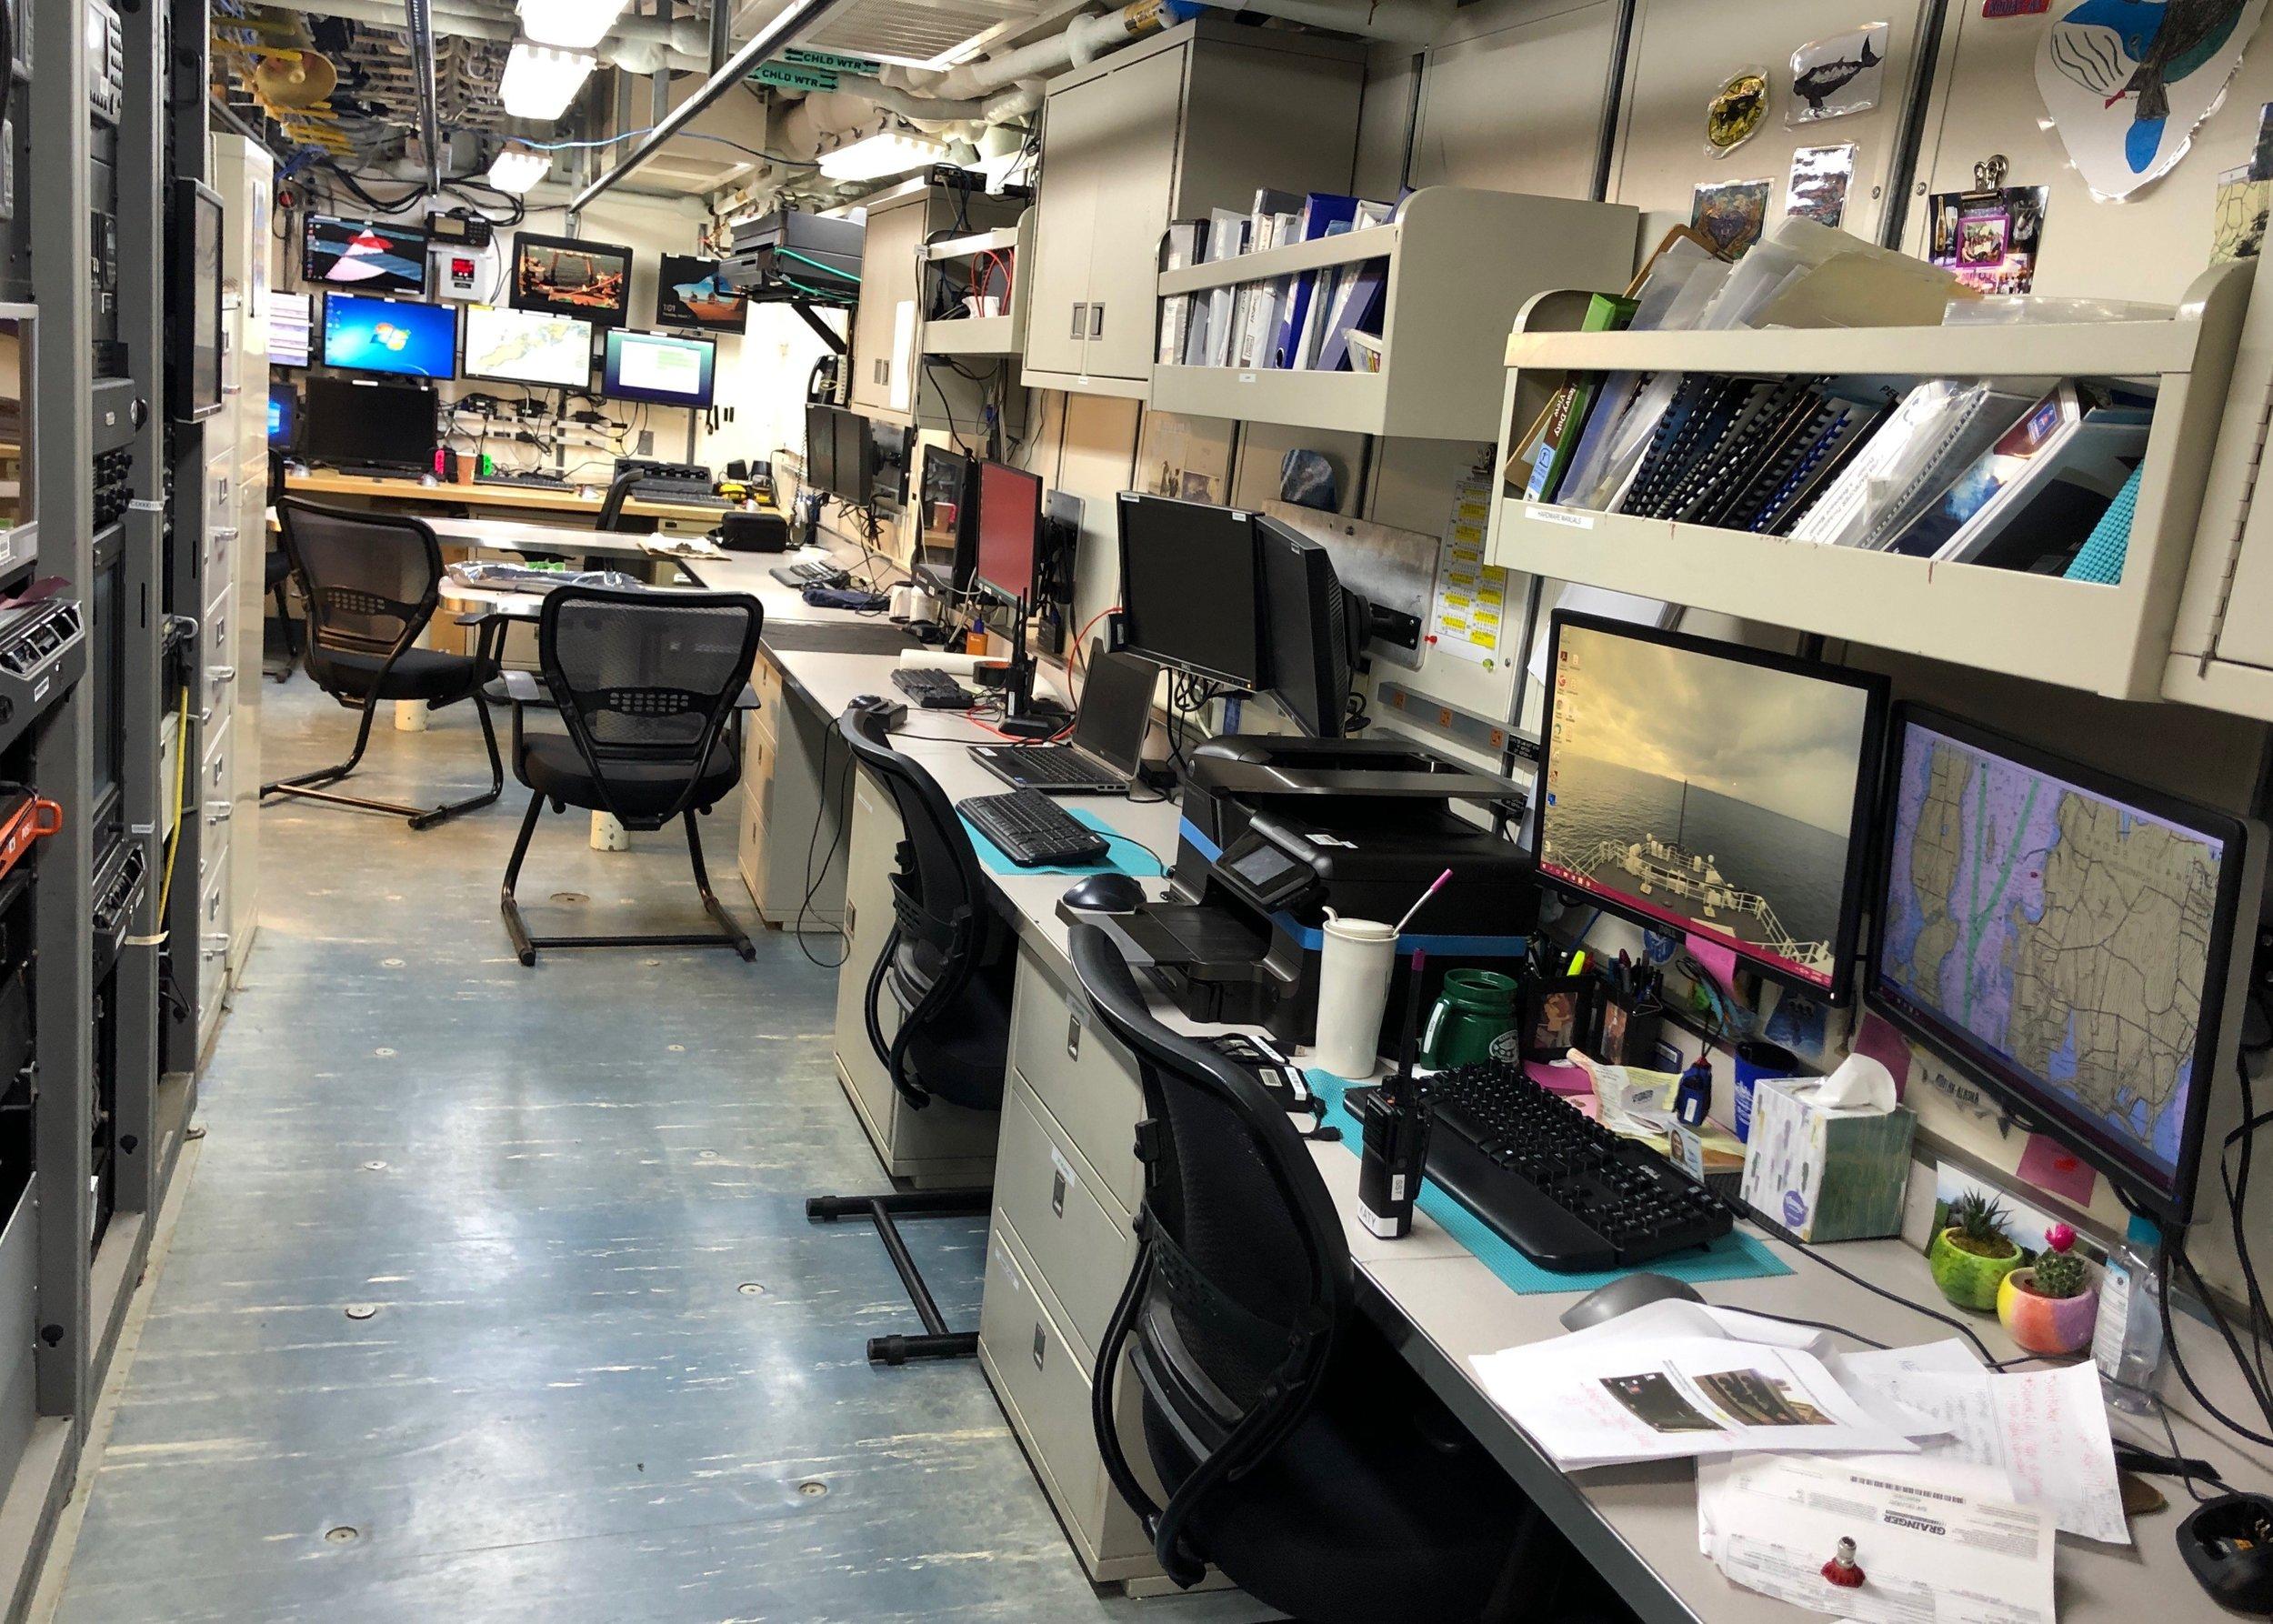 computer room1.jpg